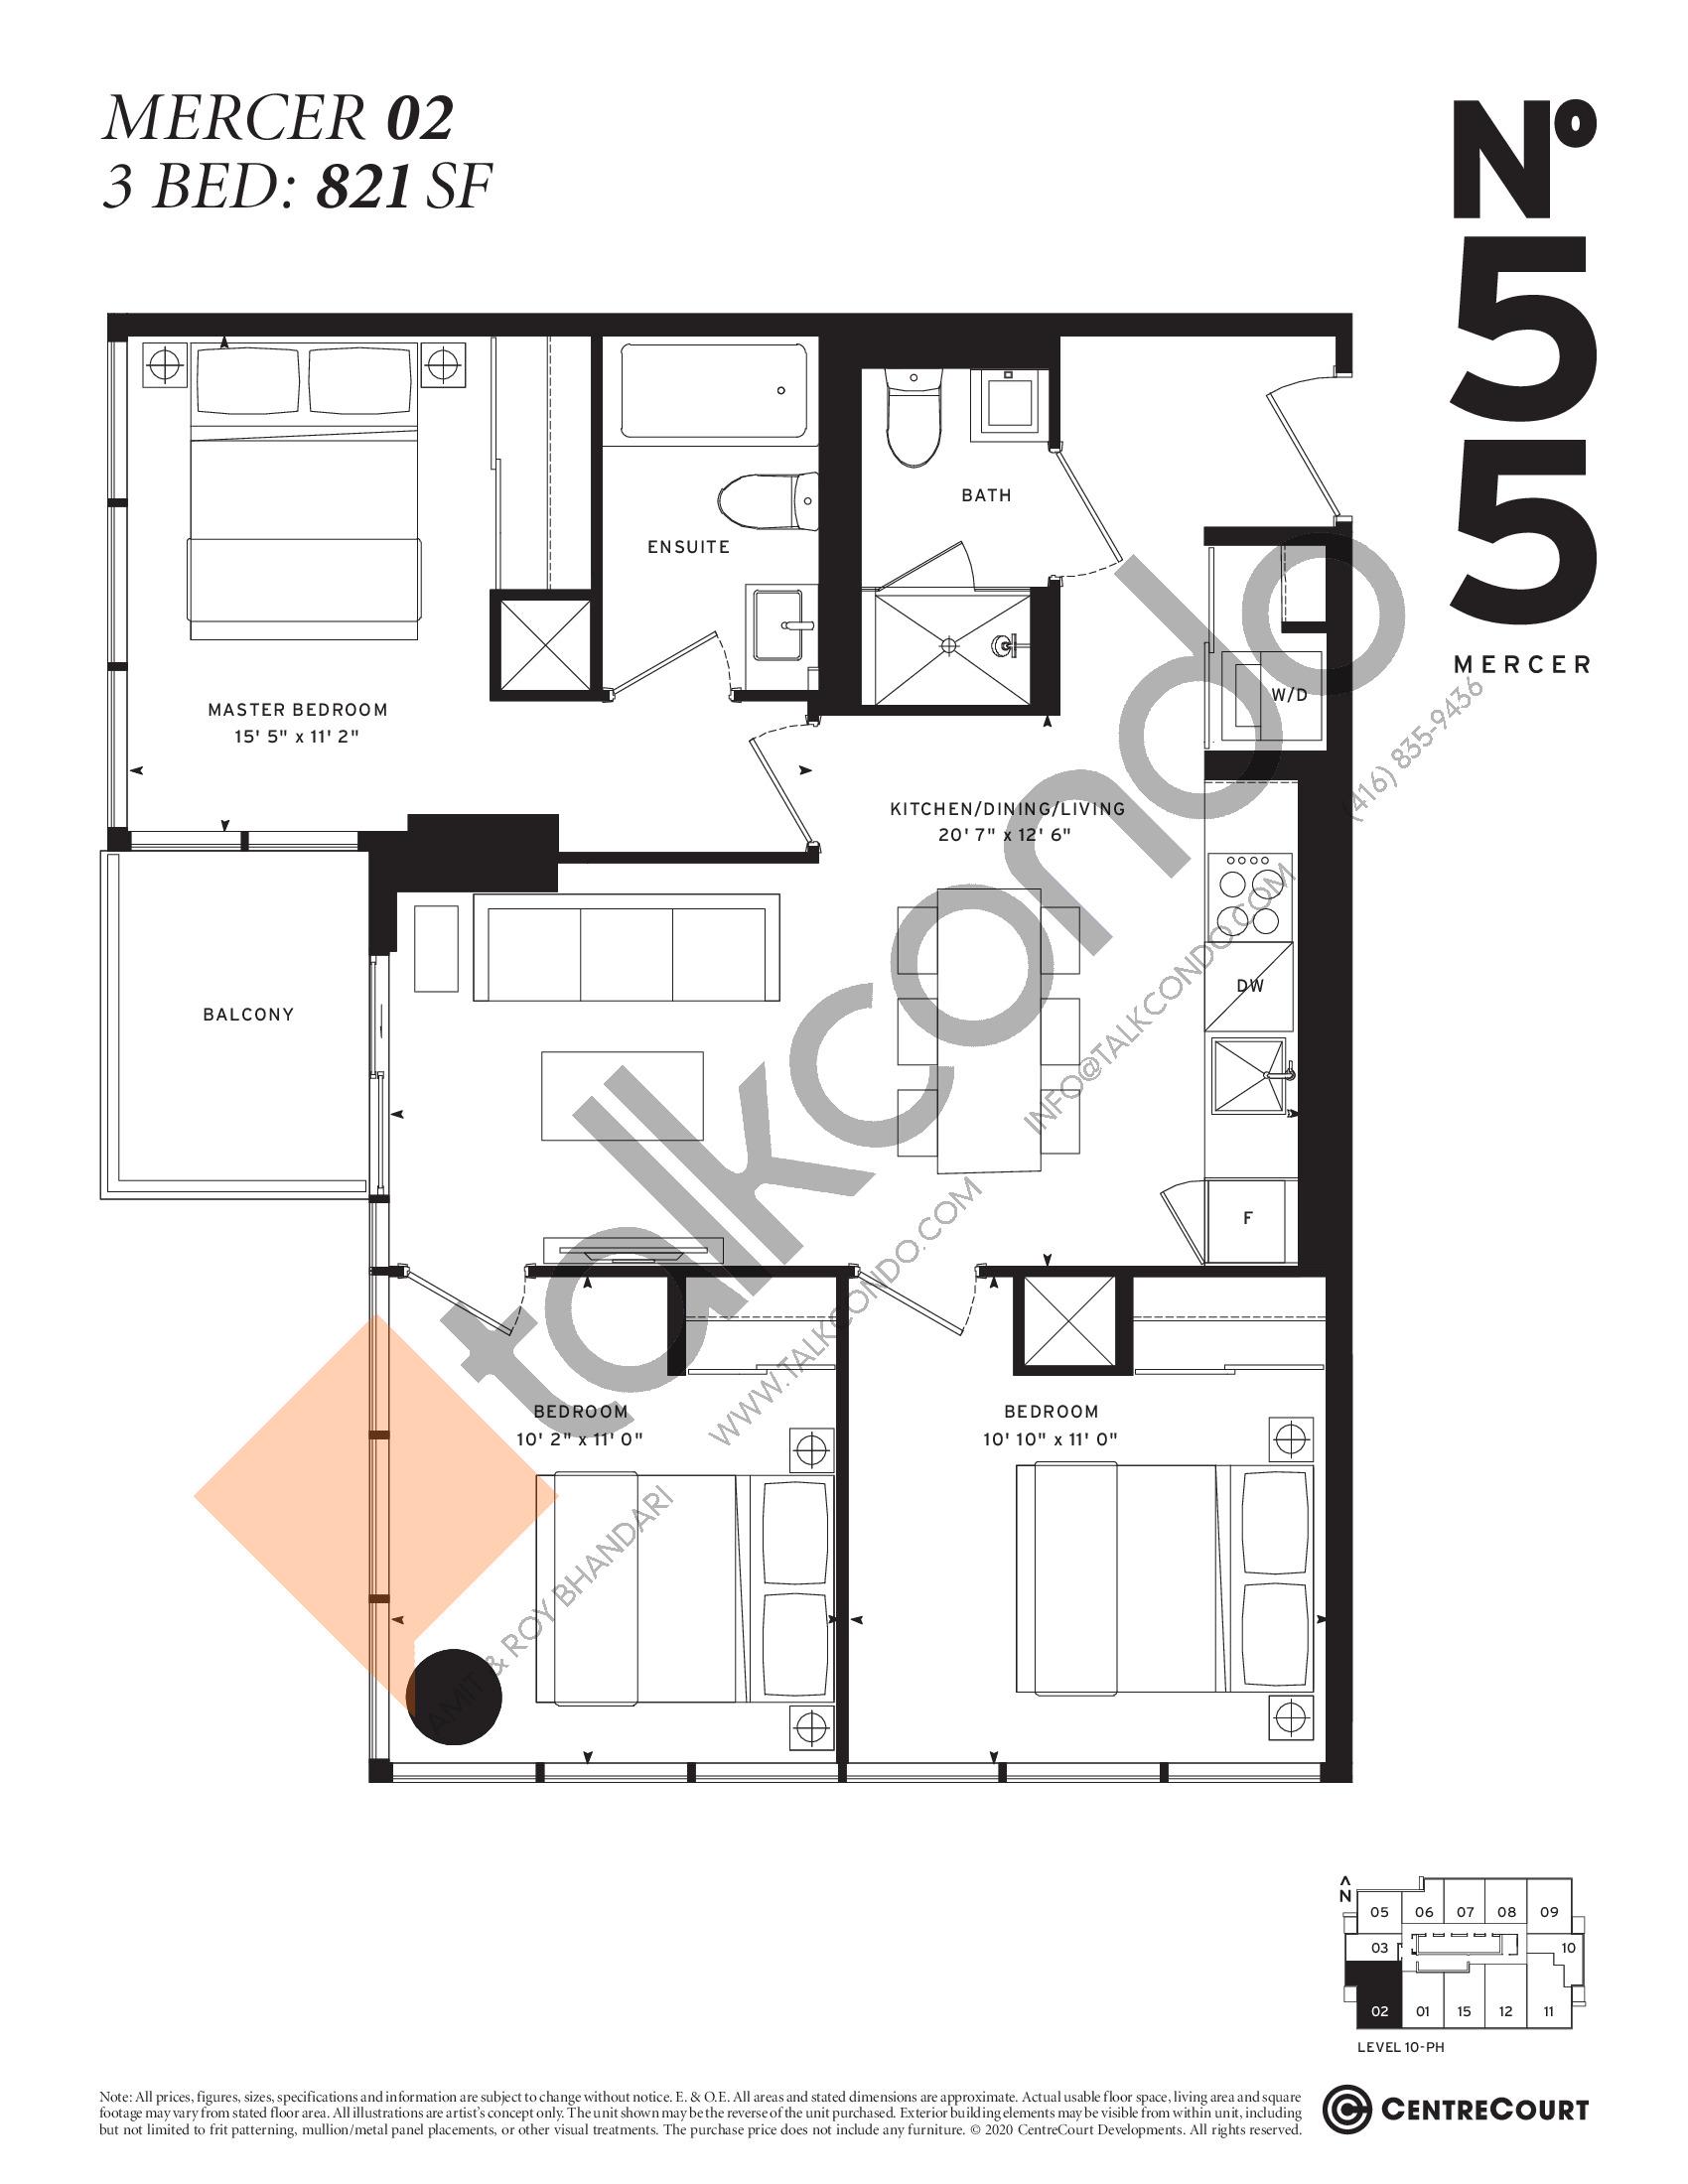 Mercer 02 Floor Plan at No. 55 Mercer Condos - 821 sq.ft